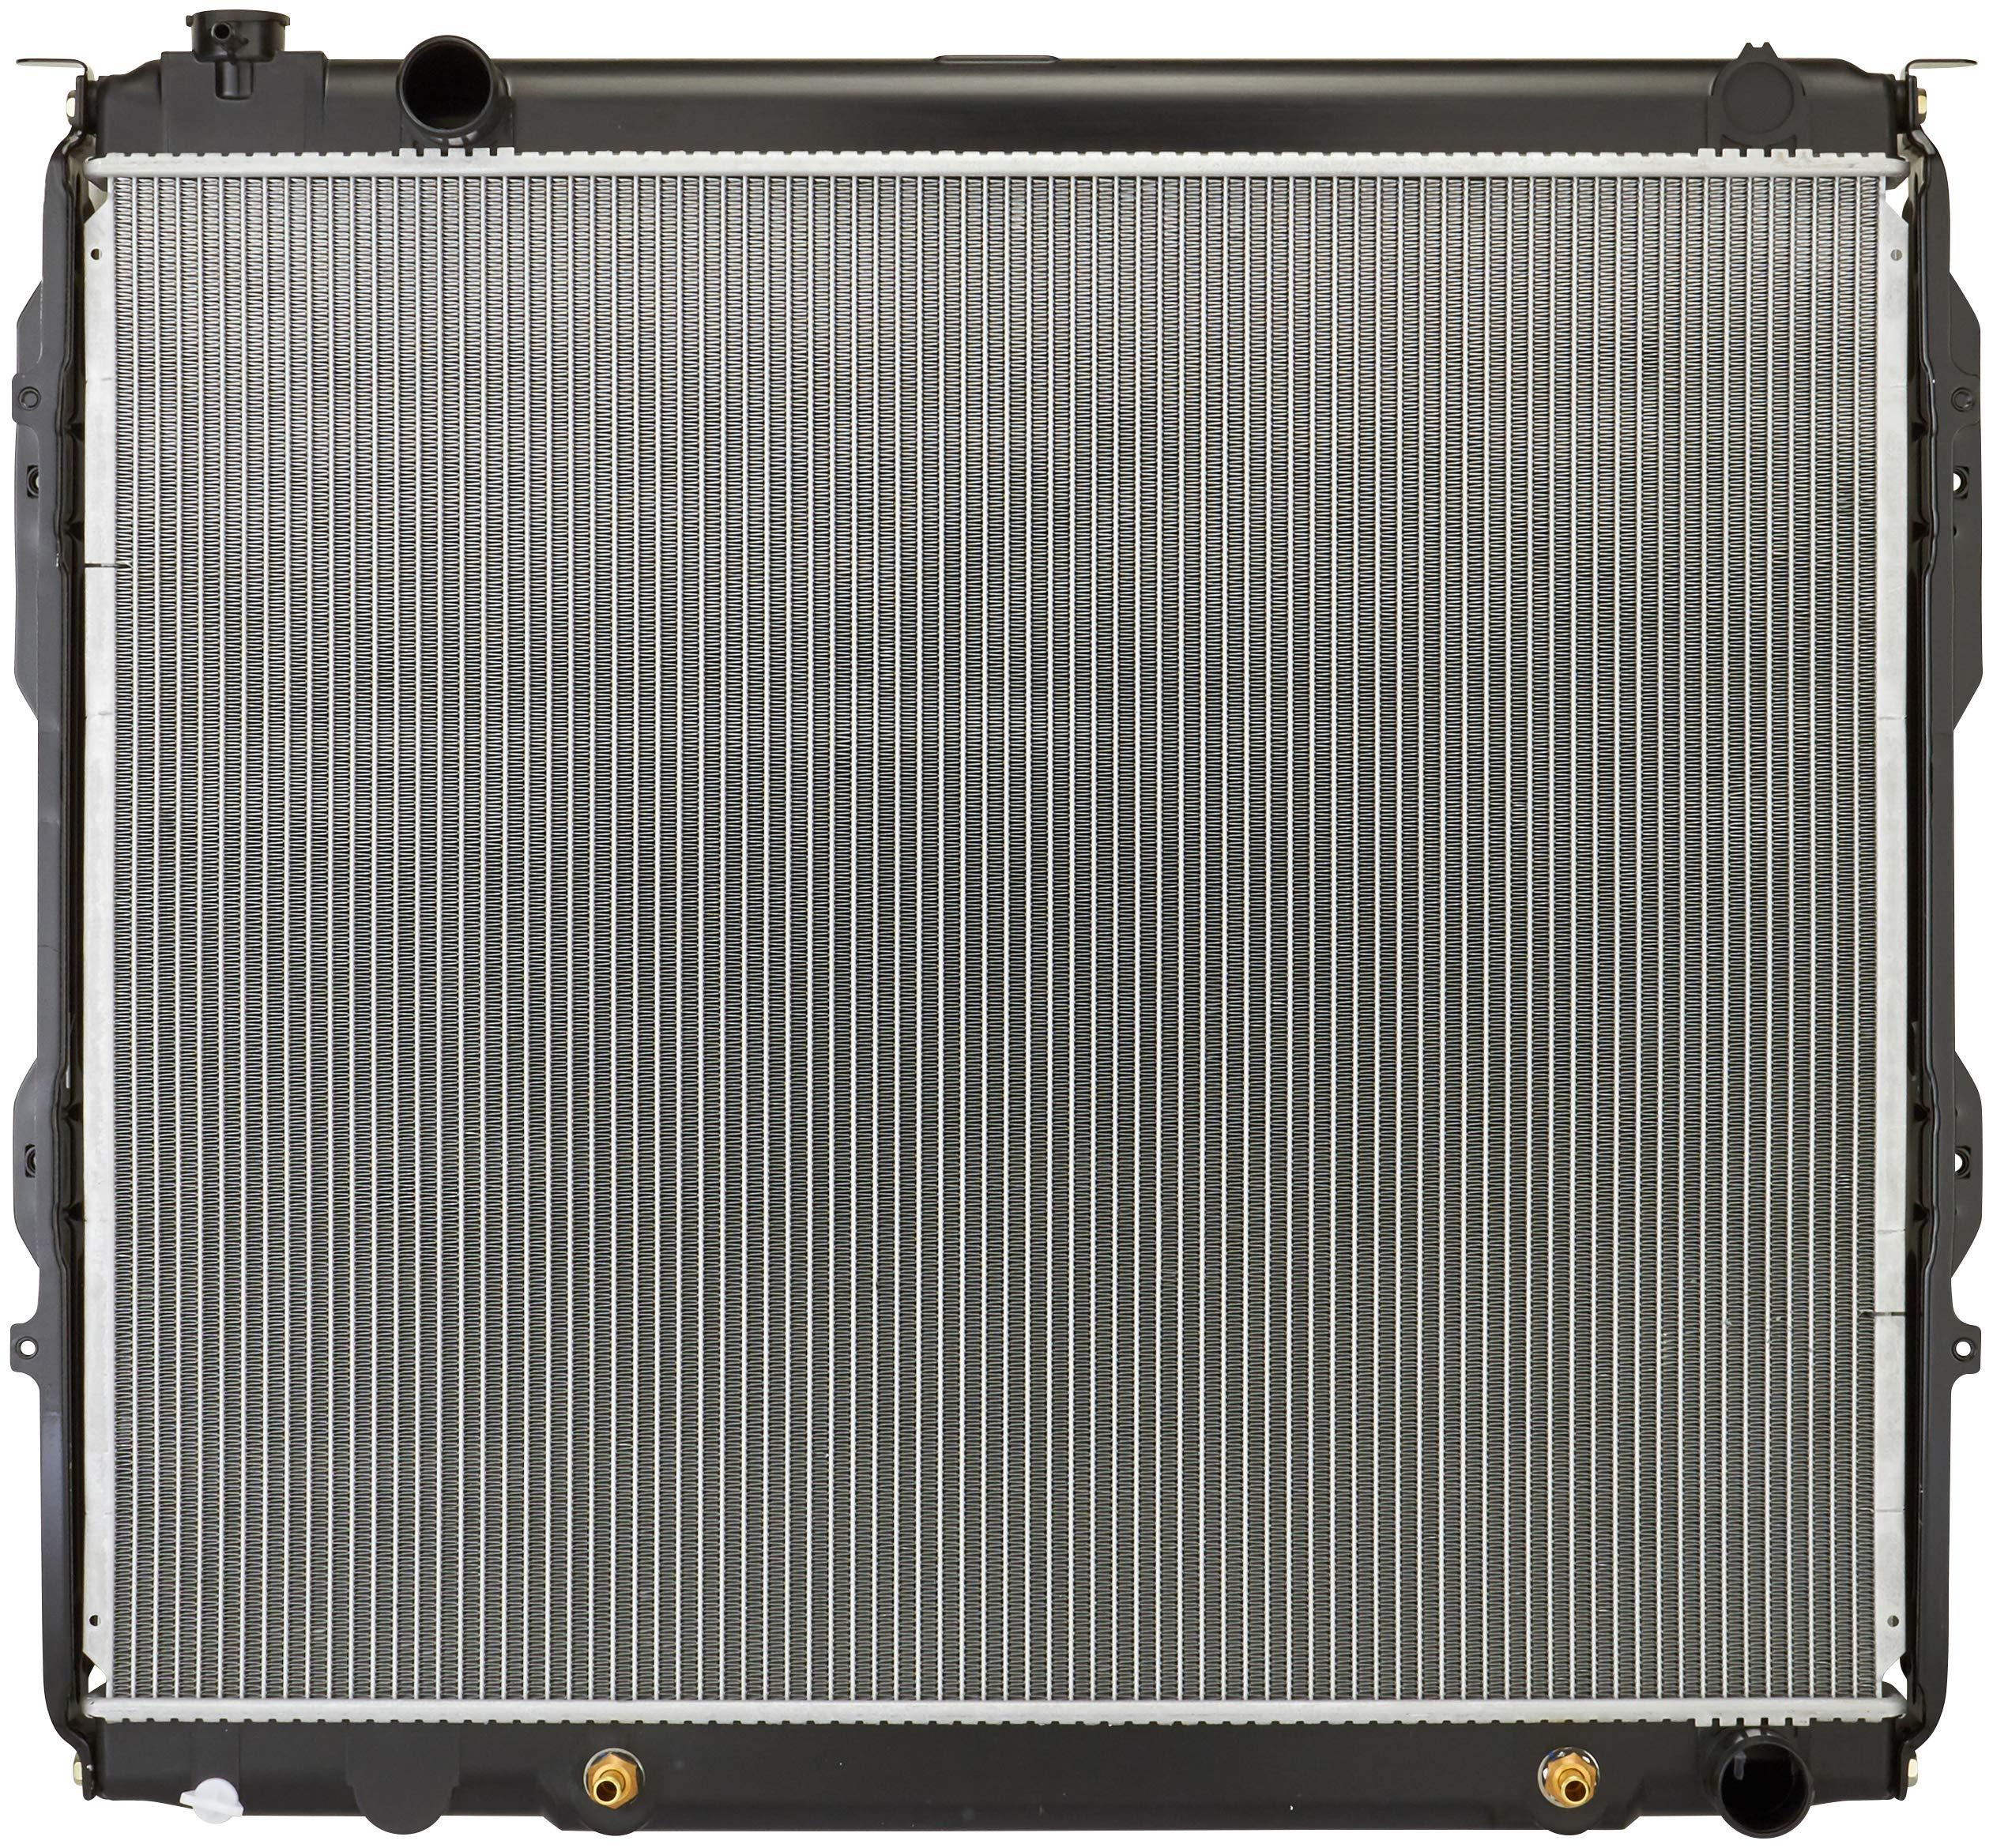 Spectra Premium CU2376 Complete Radiator for Toyota Sequoia and Tundra